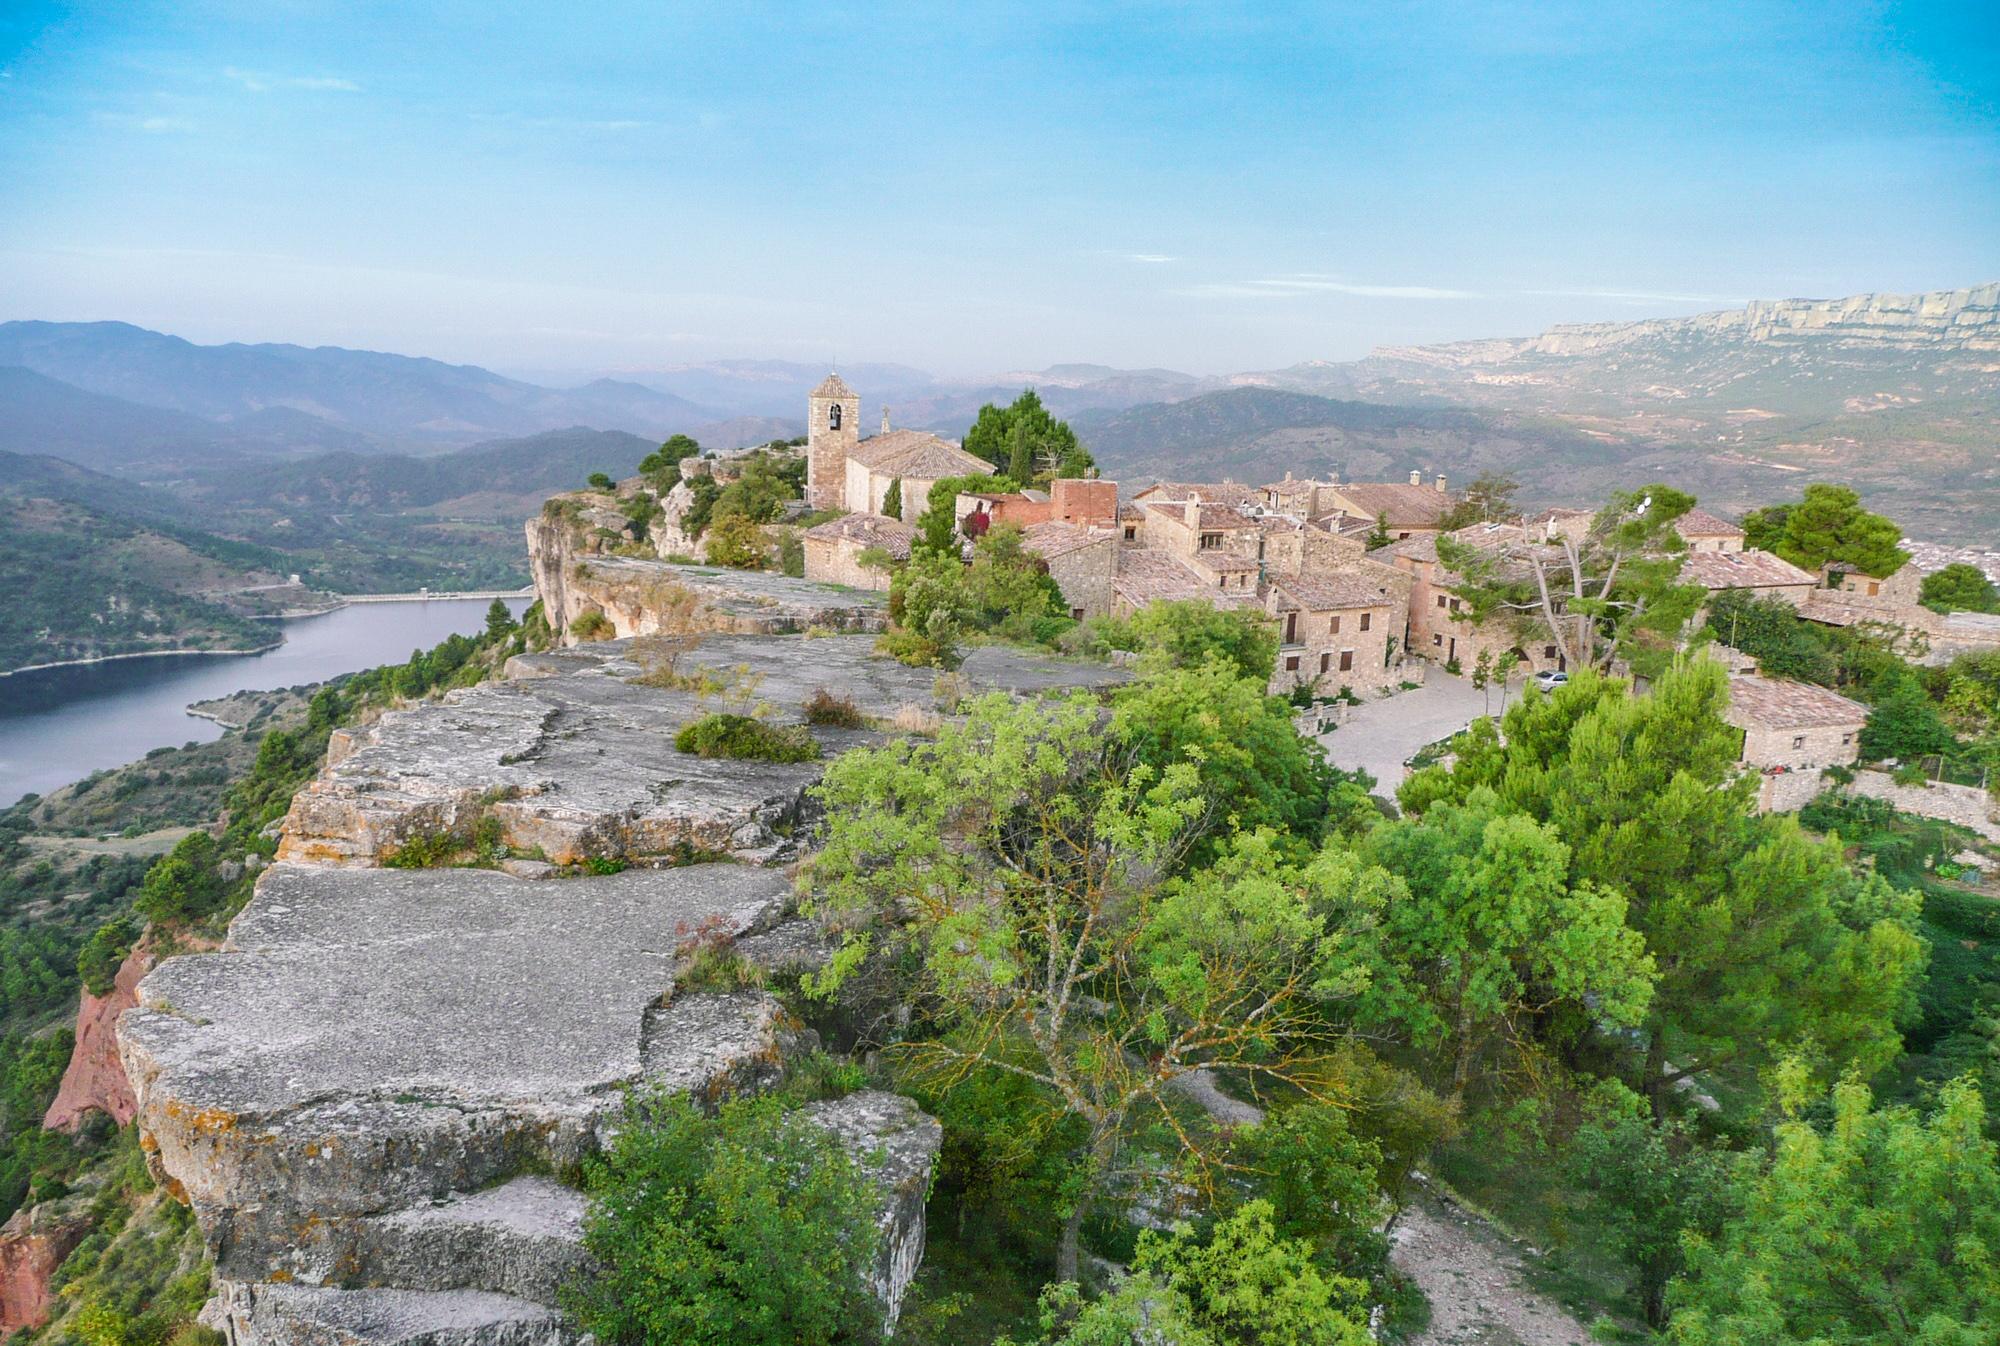 campingprades - Where to rest-Serra de Montsant